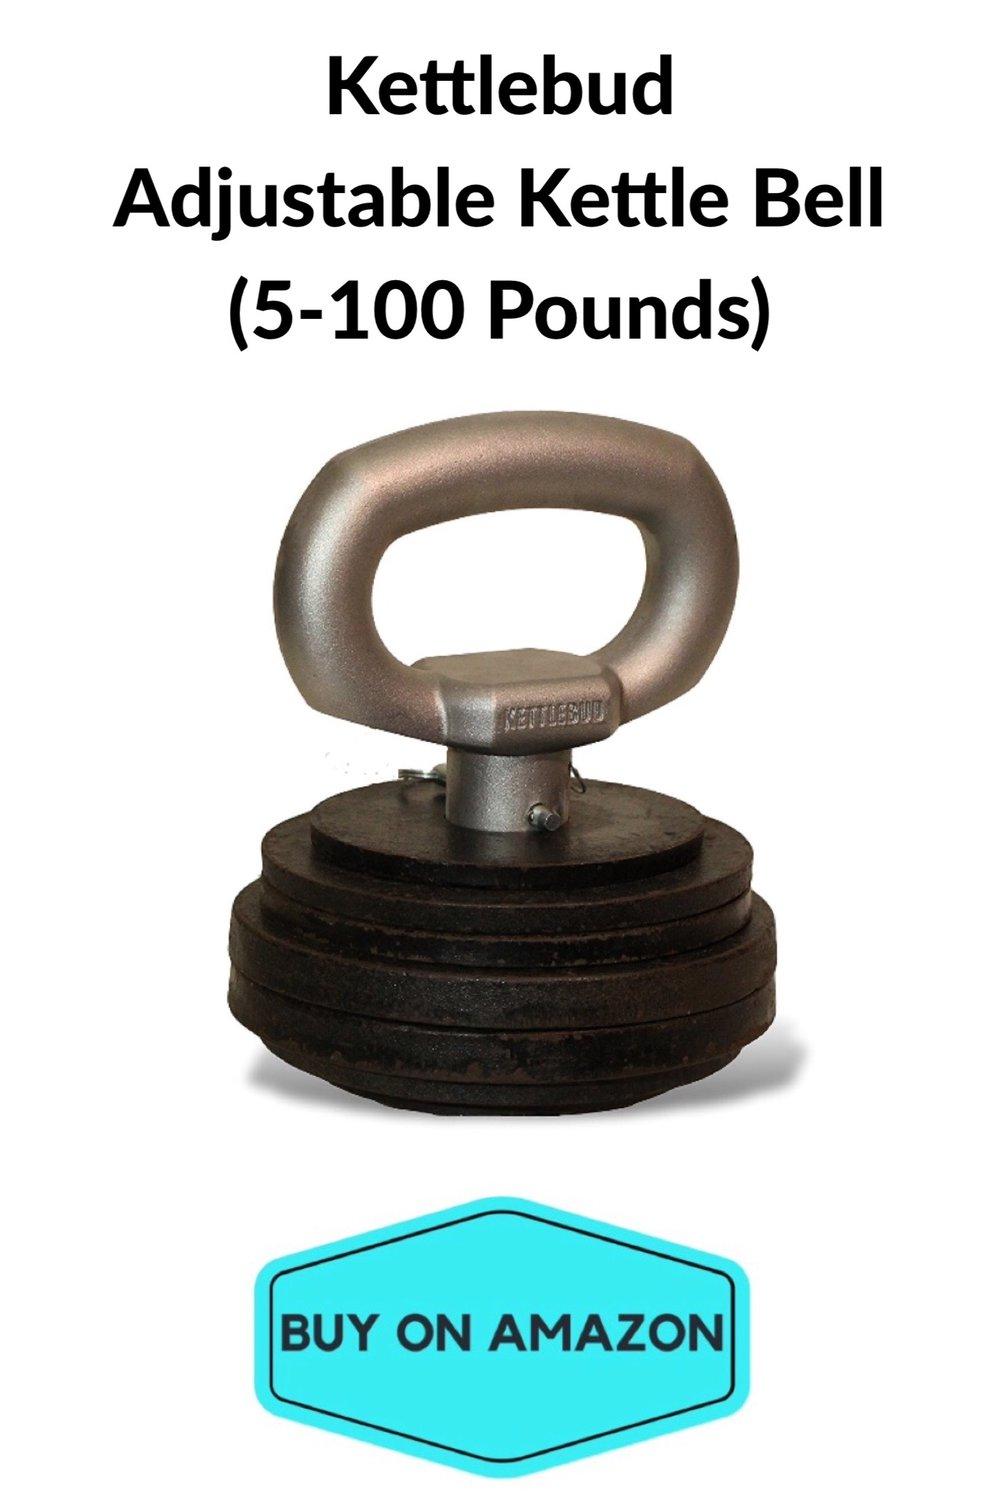 Kettlebud Adjustable Kettle Bell